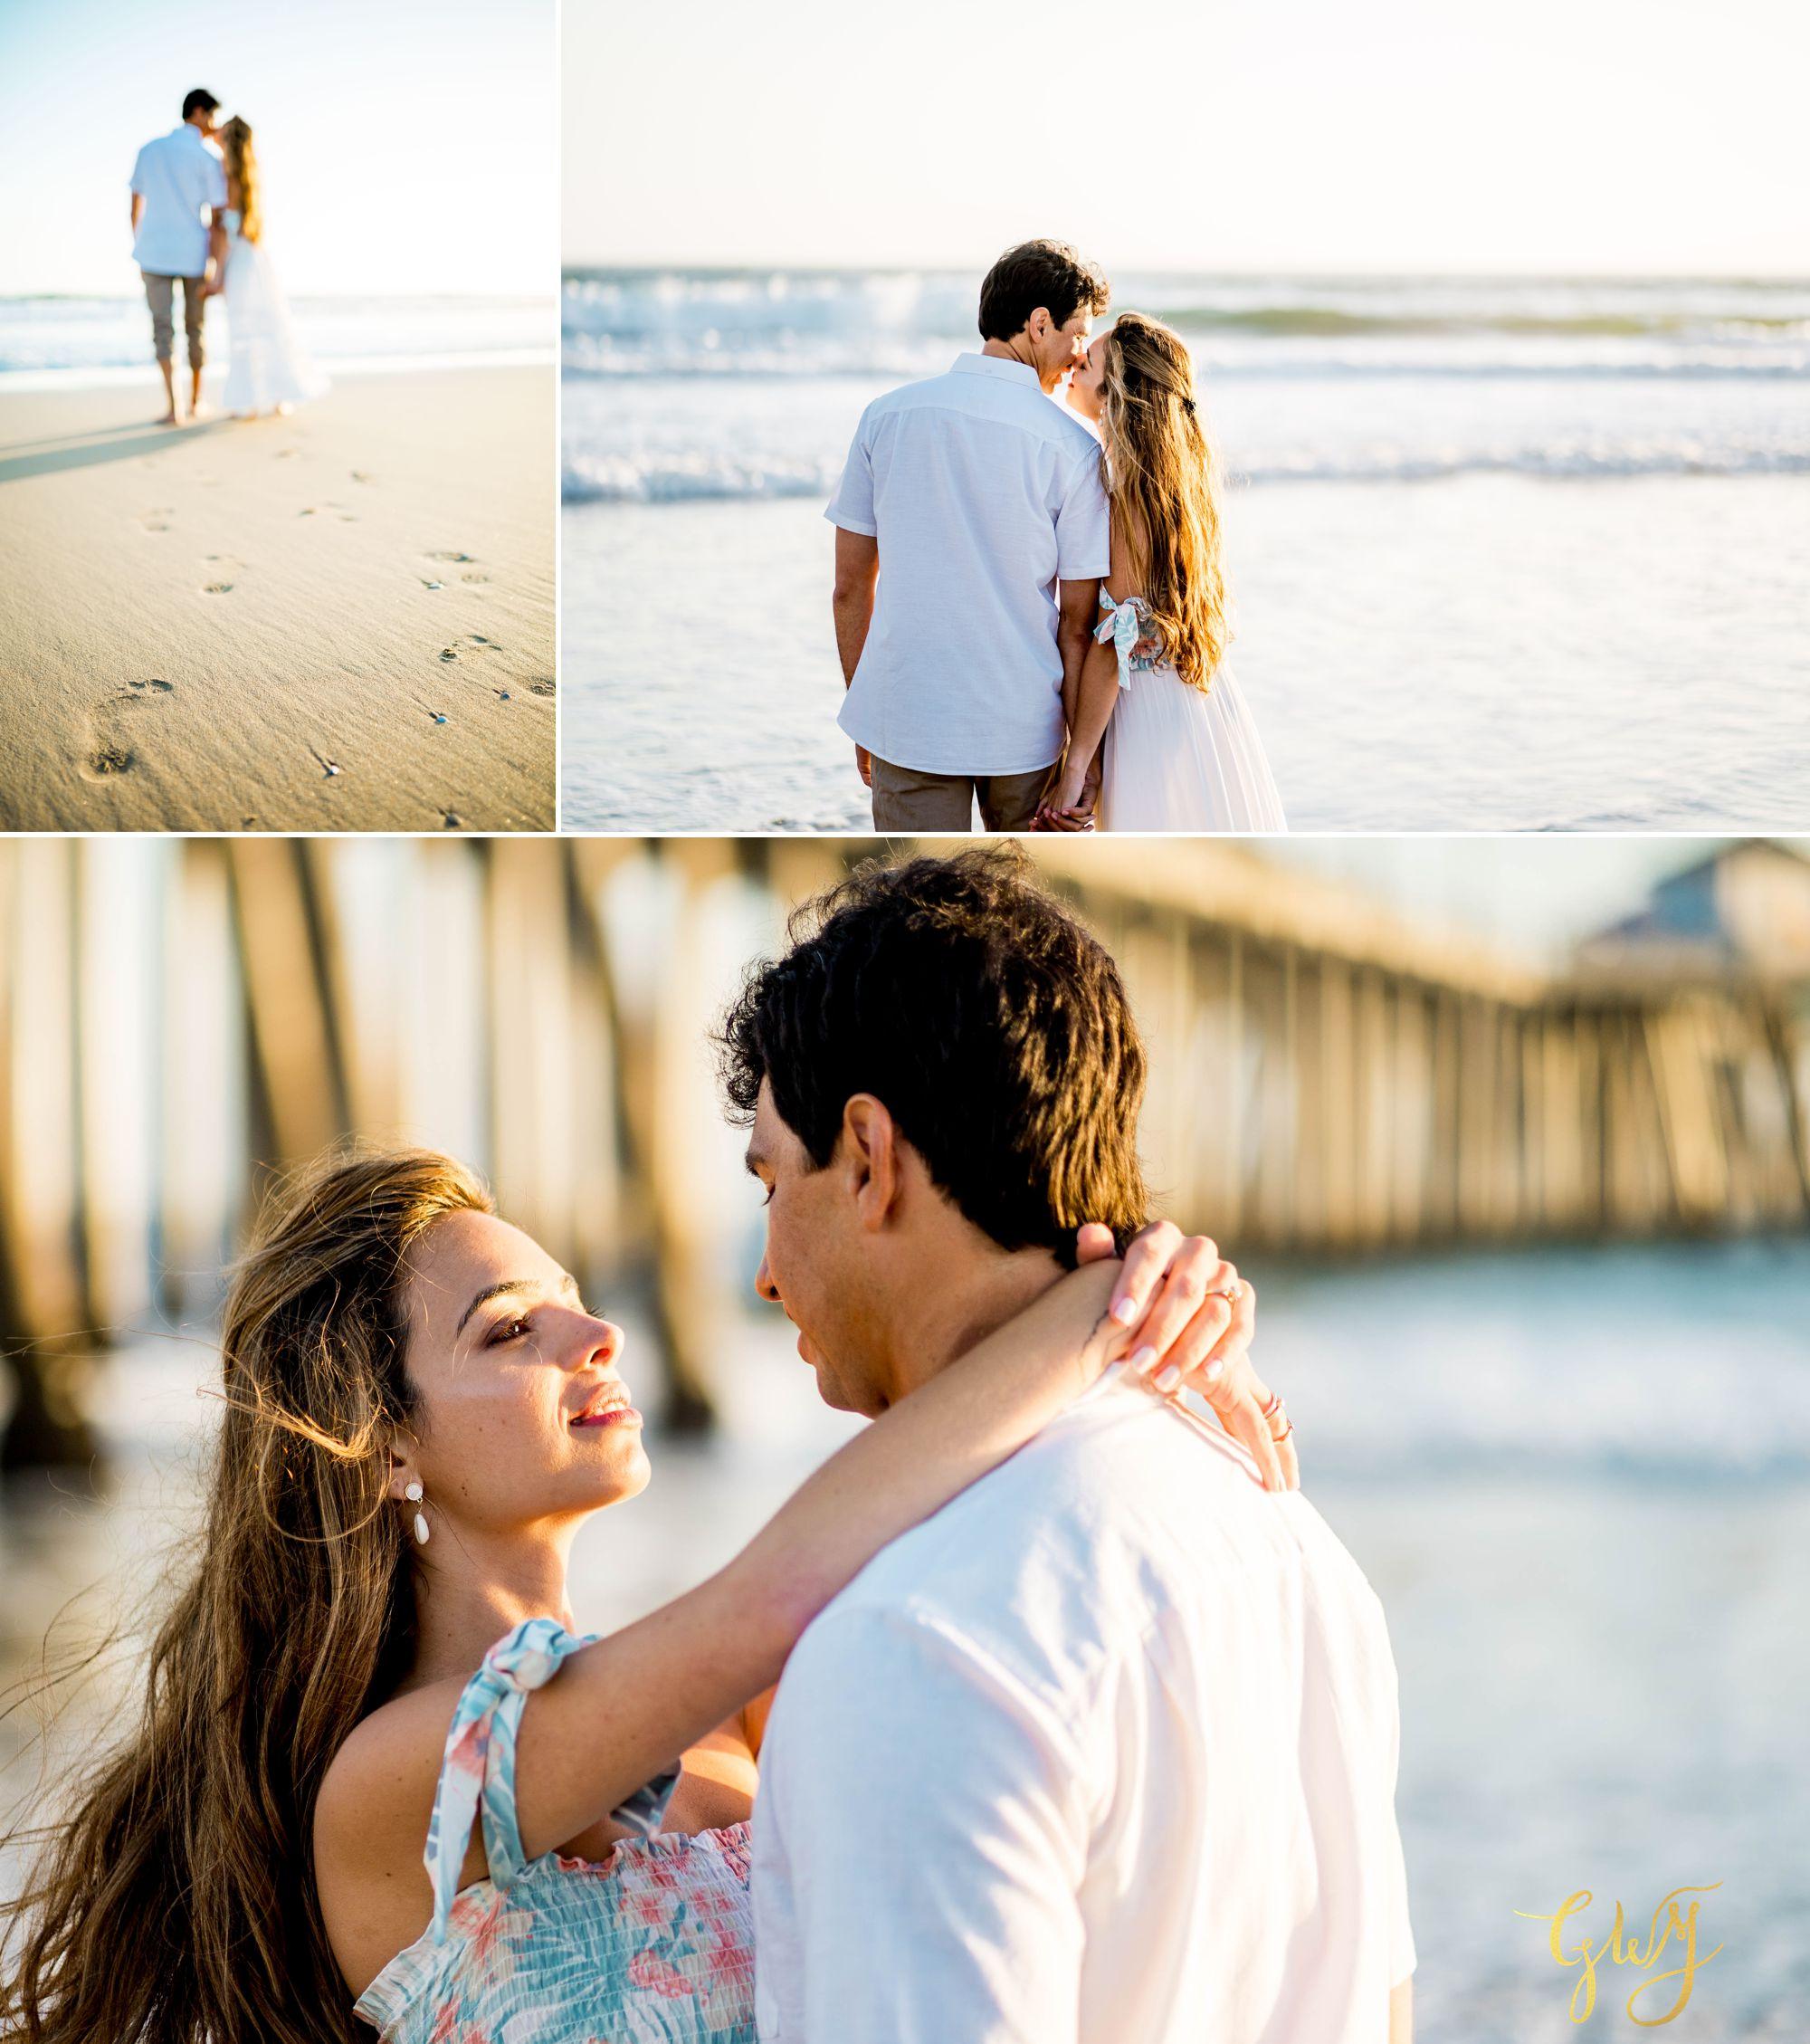 Felipe + Isabella Huntington Beach Summer Sunset Engagement Session by Glass Woods Media 15.jpg